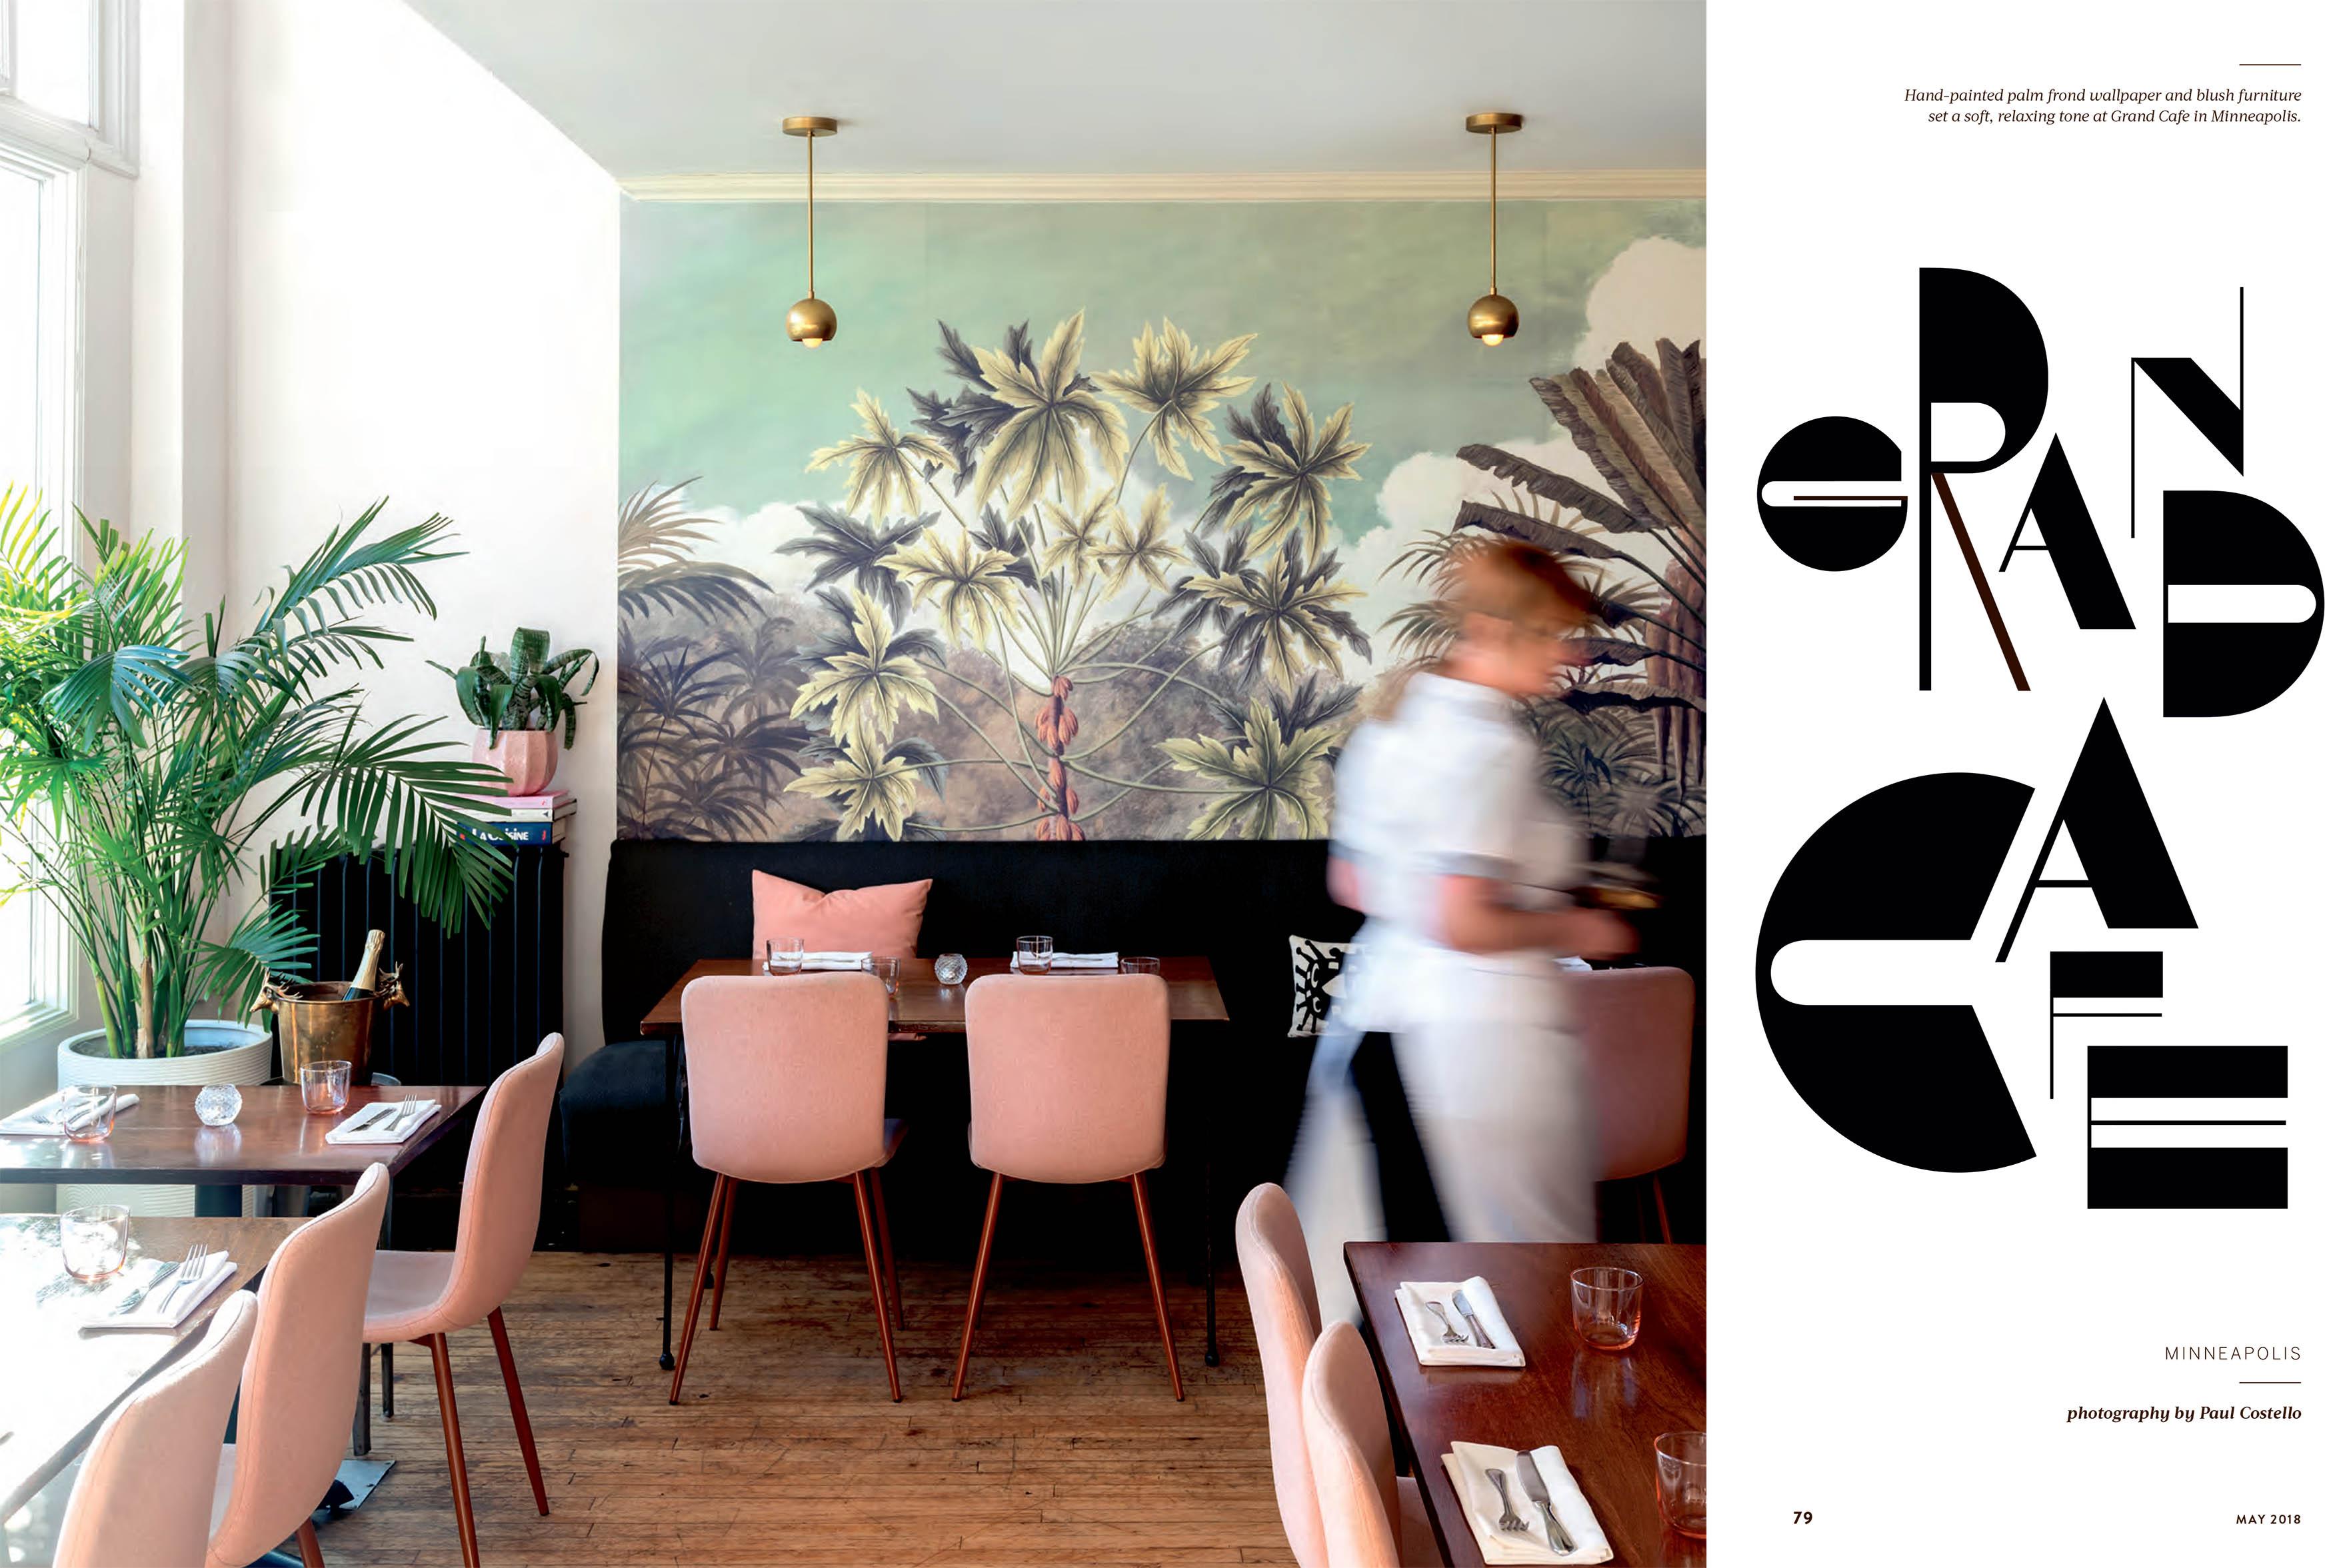 Luxury Jimmy Grand Cafe Menu